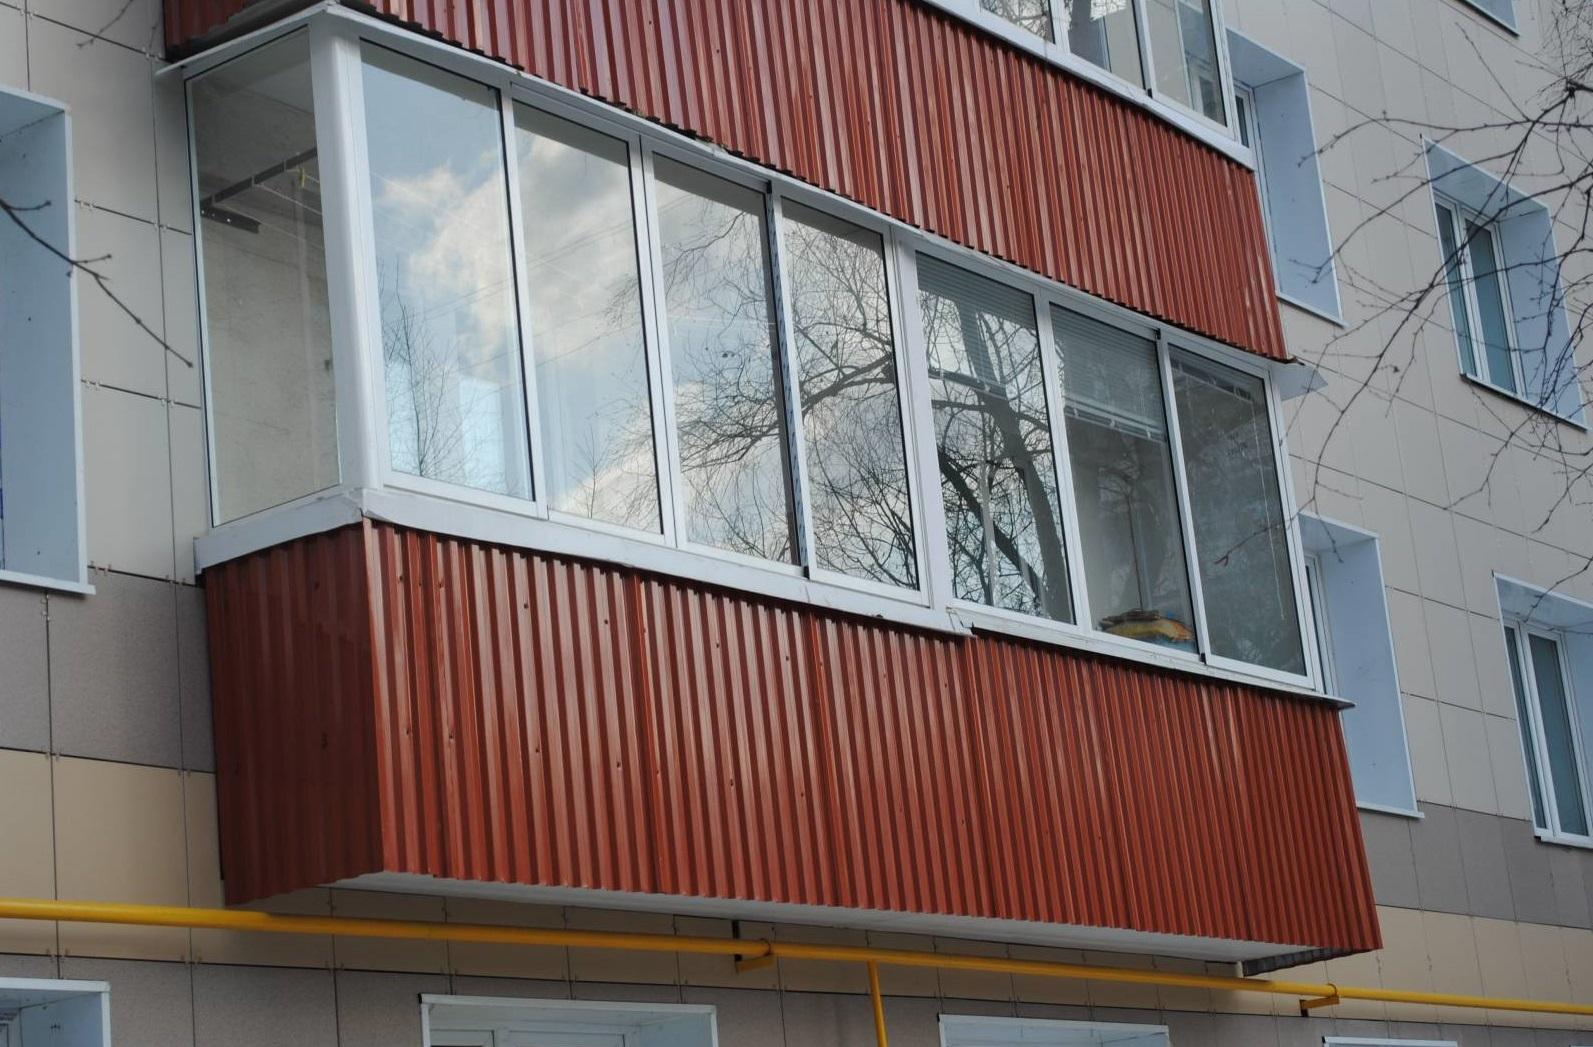 obshivka-balkona-profnastilom1